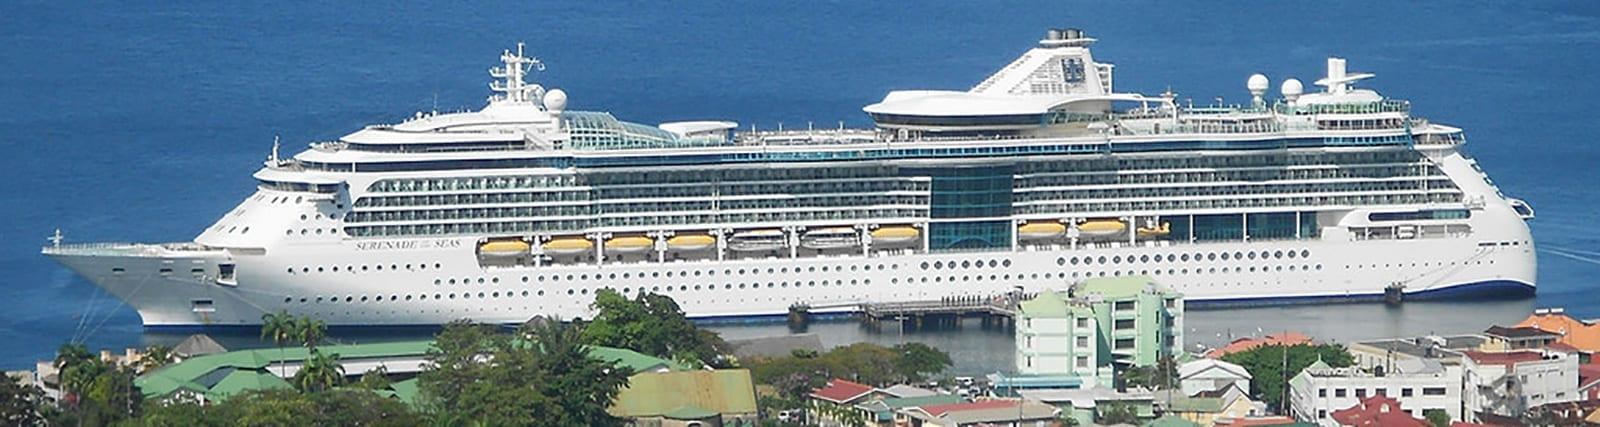 Serenade of the seas cruise